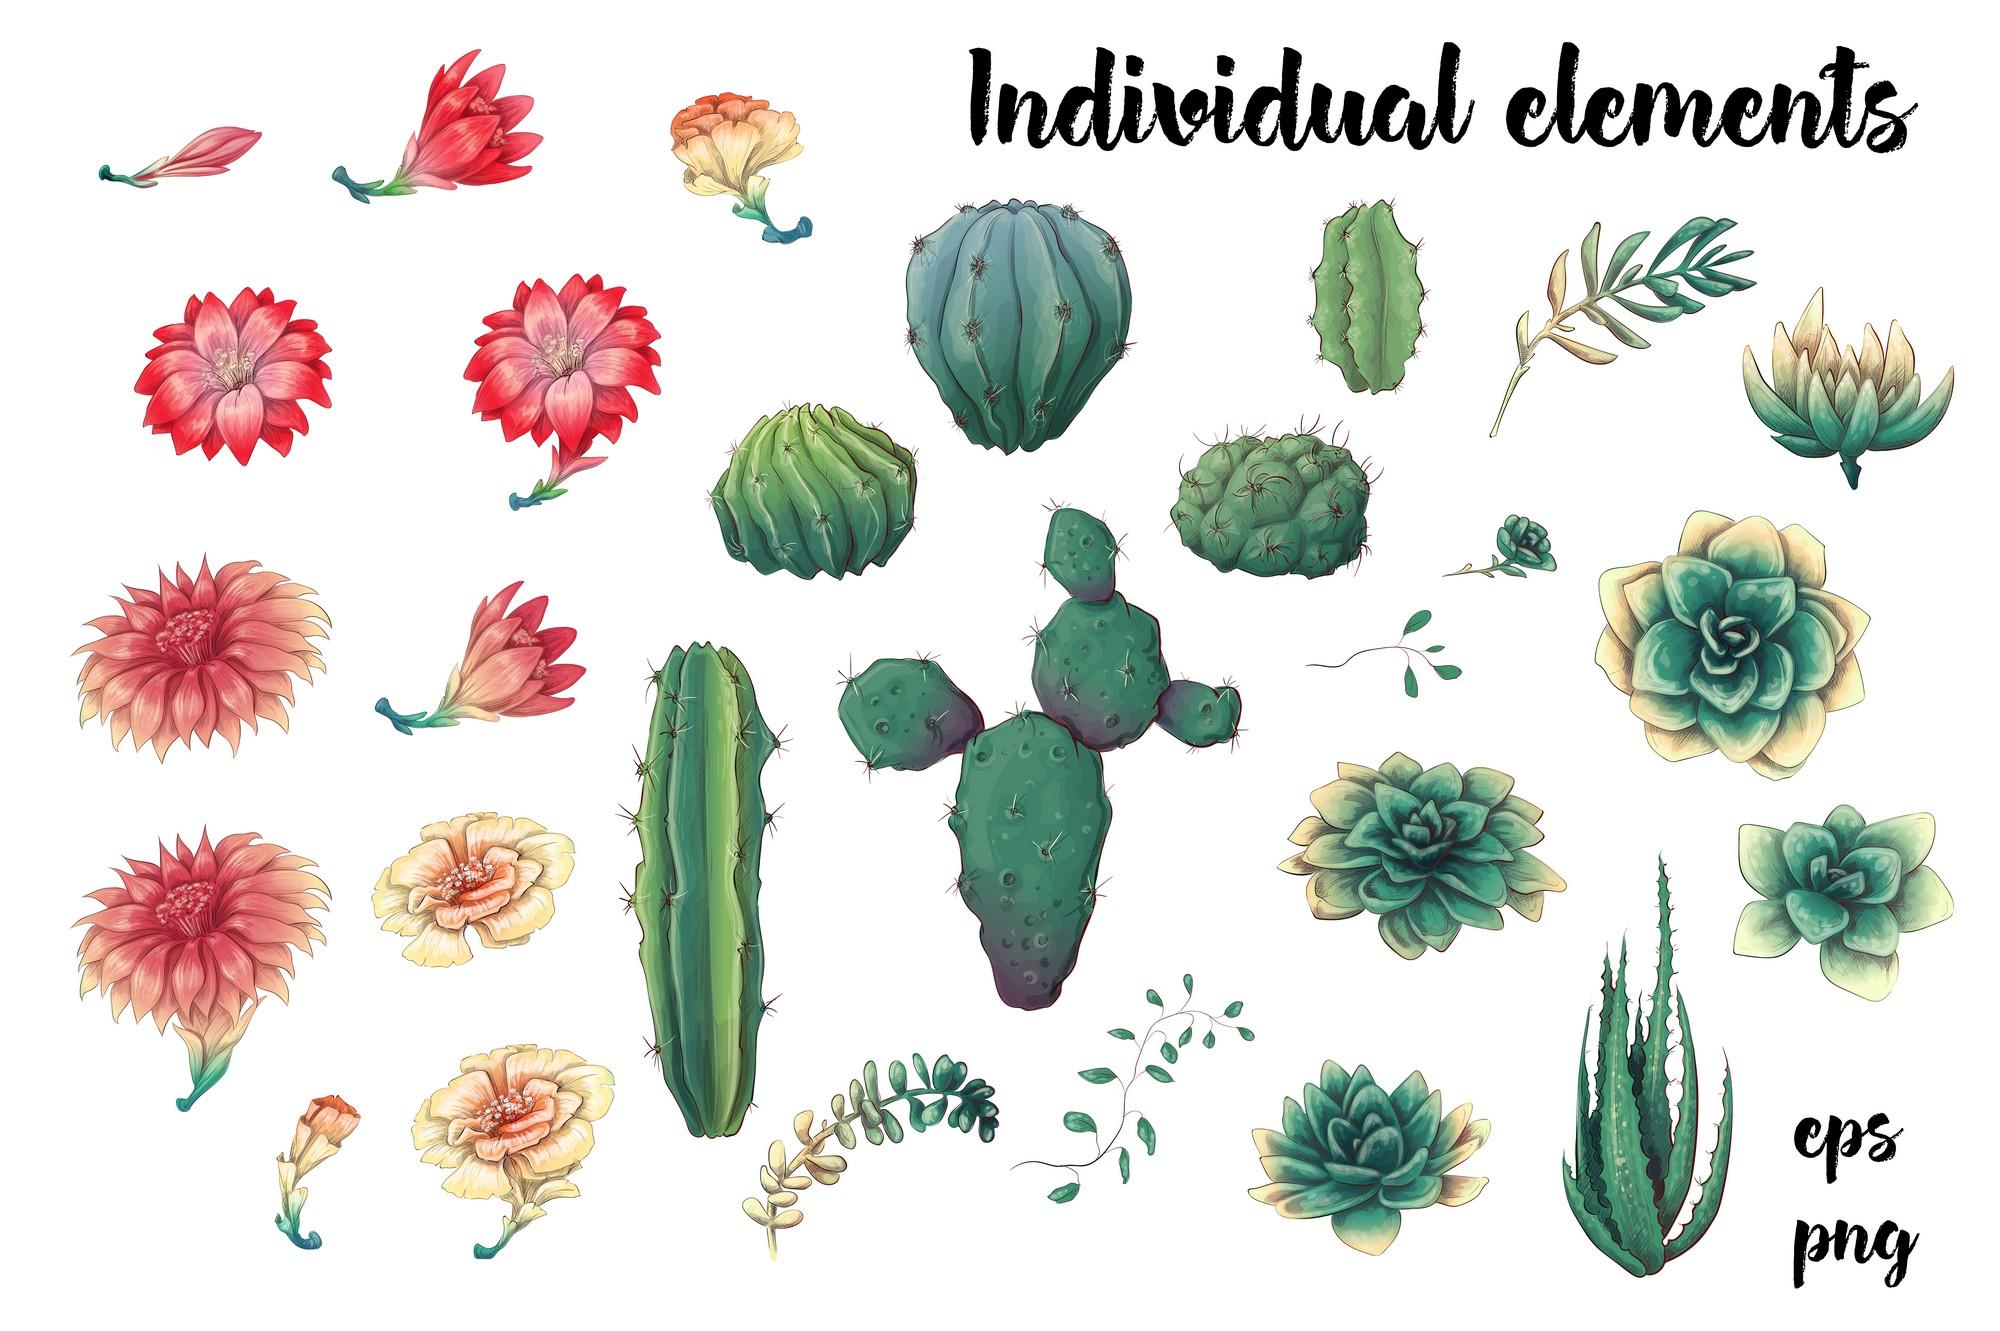 Cute Cactus Clipart: Cacti & Succulents Vectors - Image00002 1